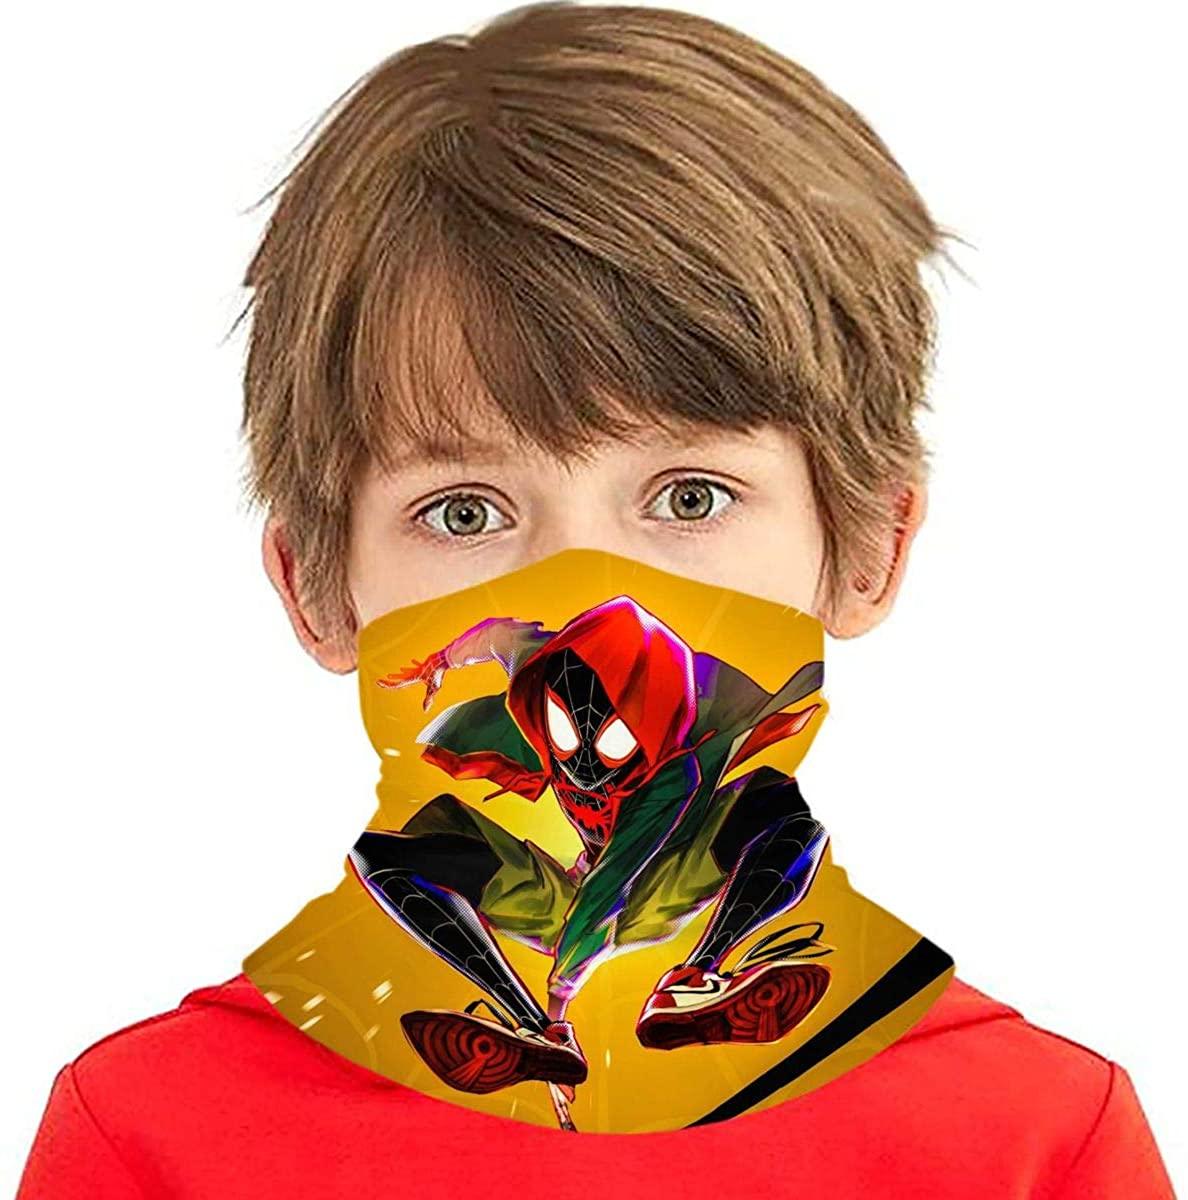 3D Super Hero 6-14 Years Bandana Neck Gaiter Balaclava Half Face Protective Mask for Boys Girls